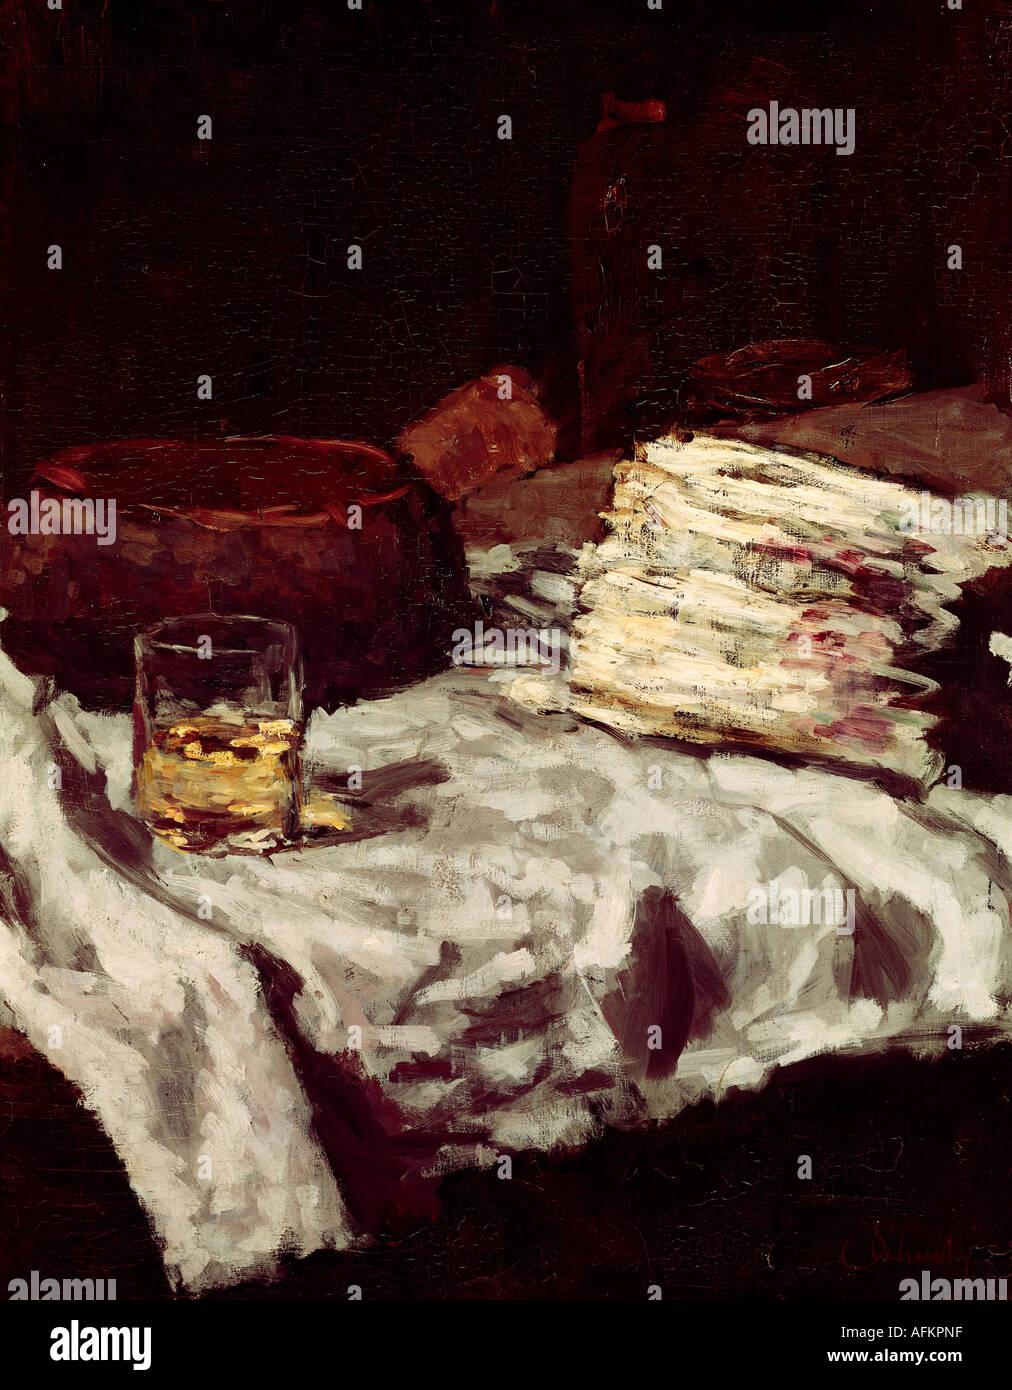 """Bellas Artes, Carl Schuch, (30.9.1846 - 13.9.1903), pintura, 'Stillleben mit Spargel', circa 1885, óleo sobre lienzo, 63x79 cm, Ne Imagen De Stock"